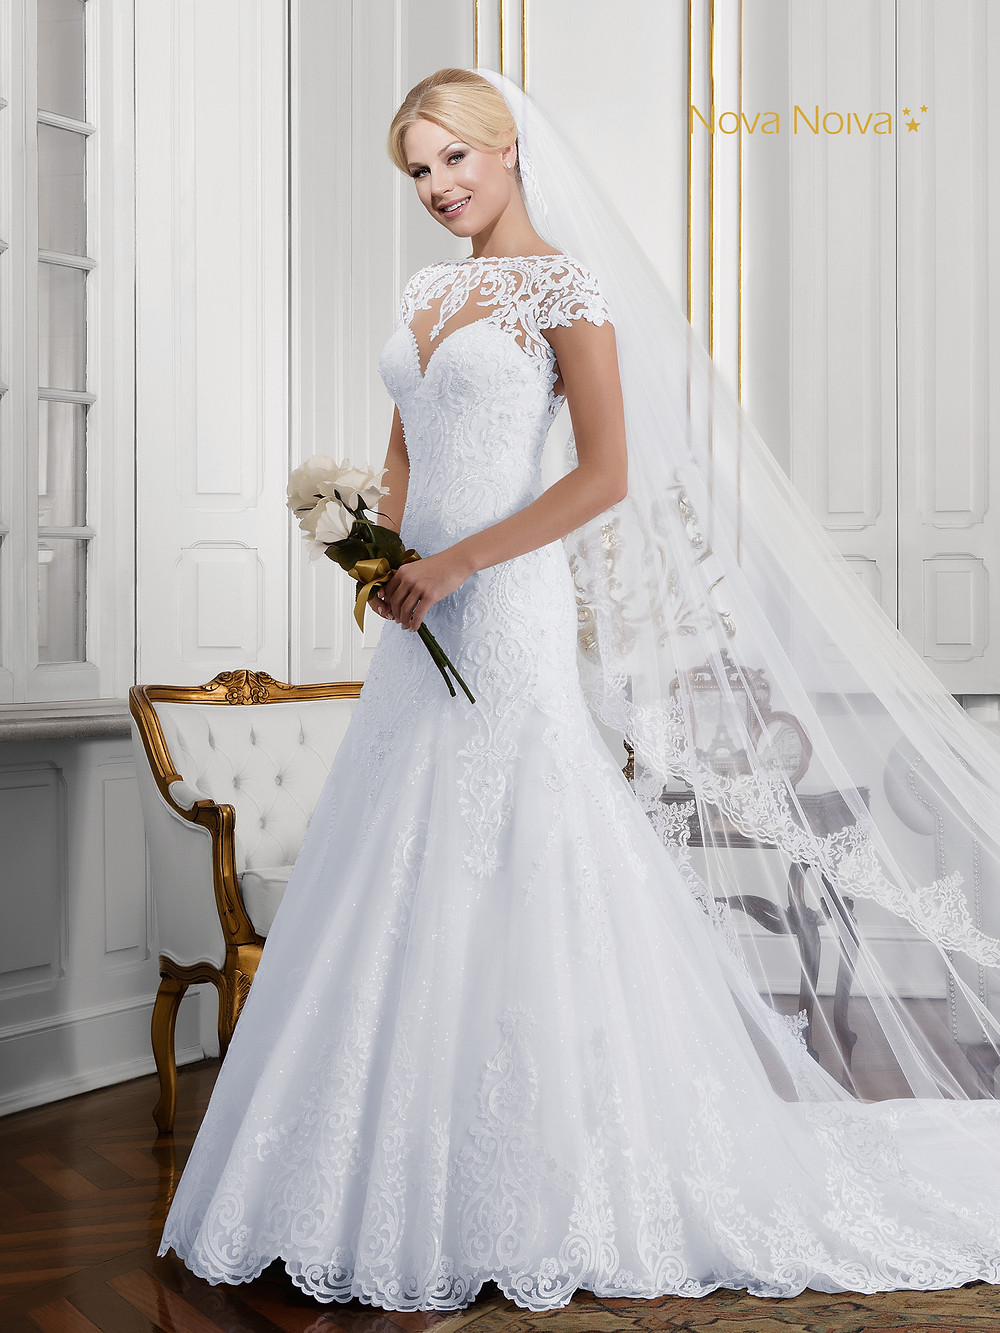 Vestido de Noiva   Véus e Mantilhas   Casamento   Blog de Casamento   Nova Noiva    Desfiles de Vestidos de Noiva